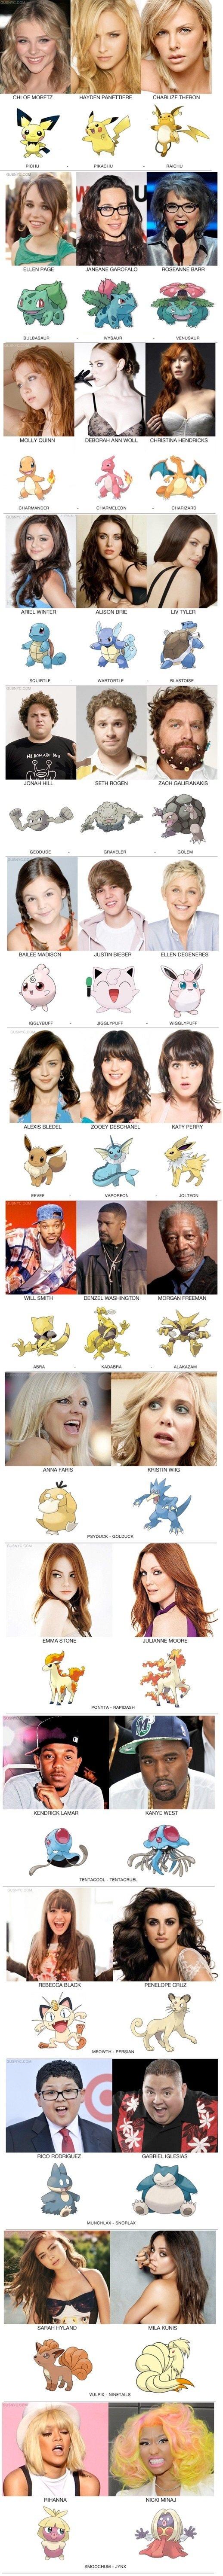 Pokemon Evolutions. . cums MORSE HAYDEN PANETTIERE CHARLIE THERON mm 7 Duncan men PAGE GAROFALO BARR MOLEV cum DEBORAH ANN won CHRISTINA HENDRICKS Sammus saw RU Pokemon Evolutions cums MORSE HAYDEN PANETTIERE CHARLIE THERON mm 7 Duncan men PAGE GAROFALO BARR MOLEV cum DEBORAH ANN won CHRISTINA HENDRICKS Sammus saw RU